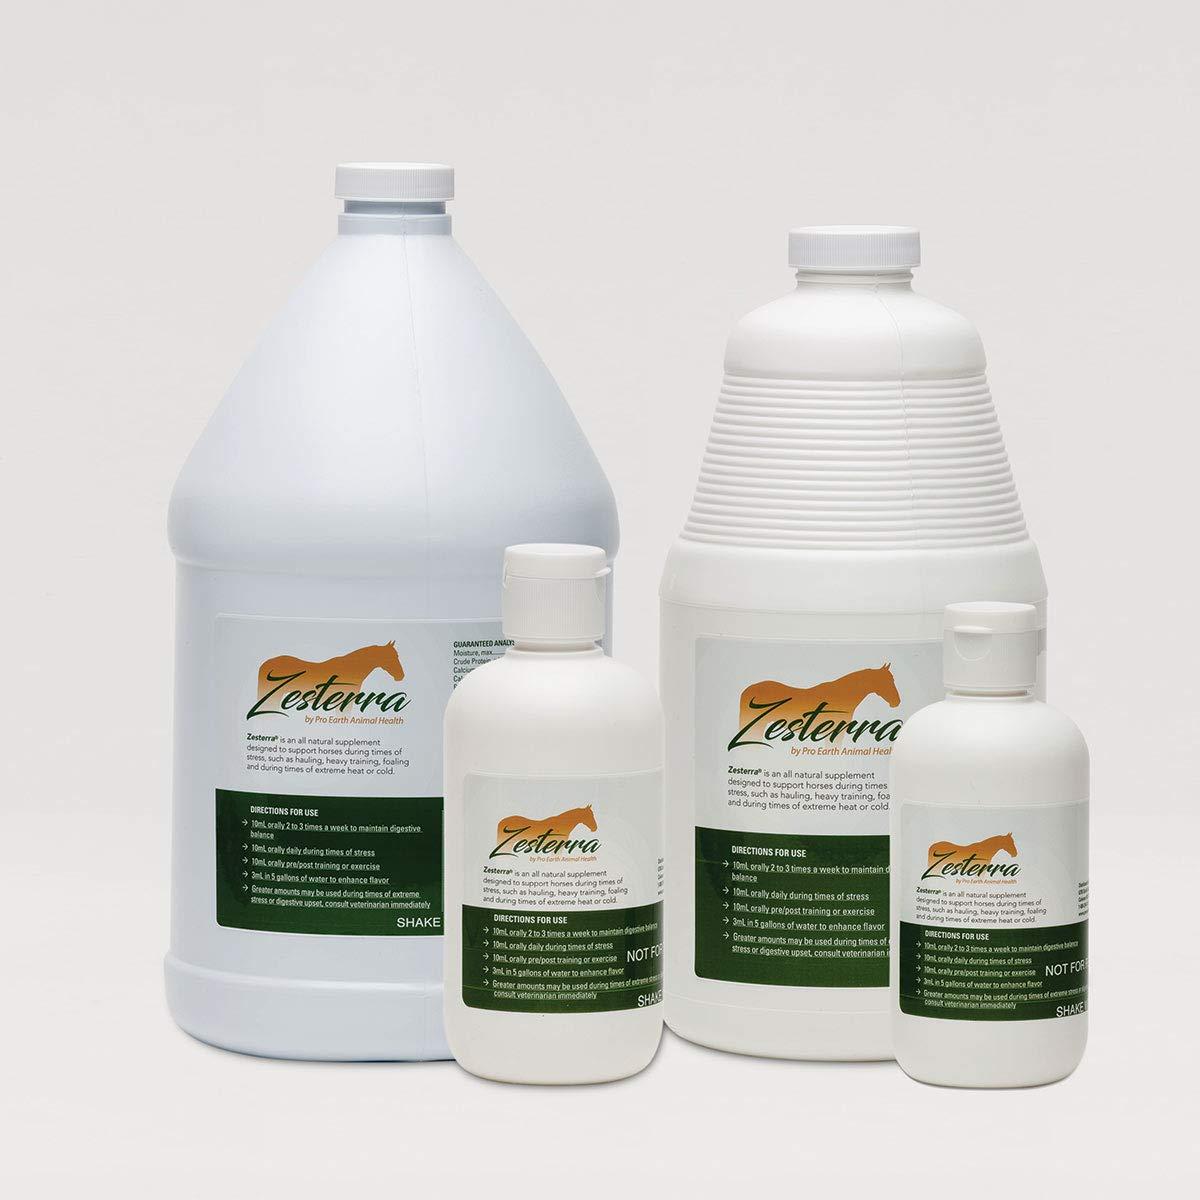 Pro Earth Animal Health Zesterra (250ml) by Pro Earth Animal Health